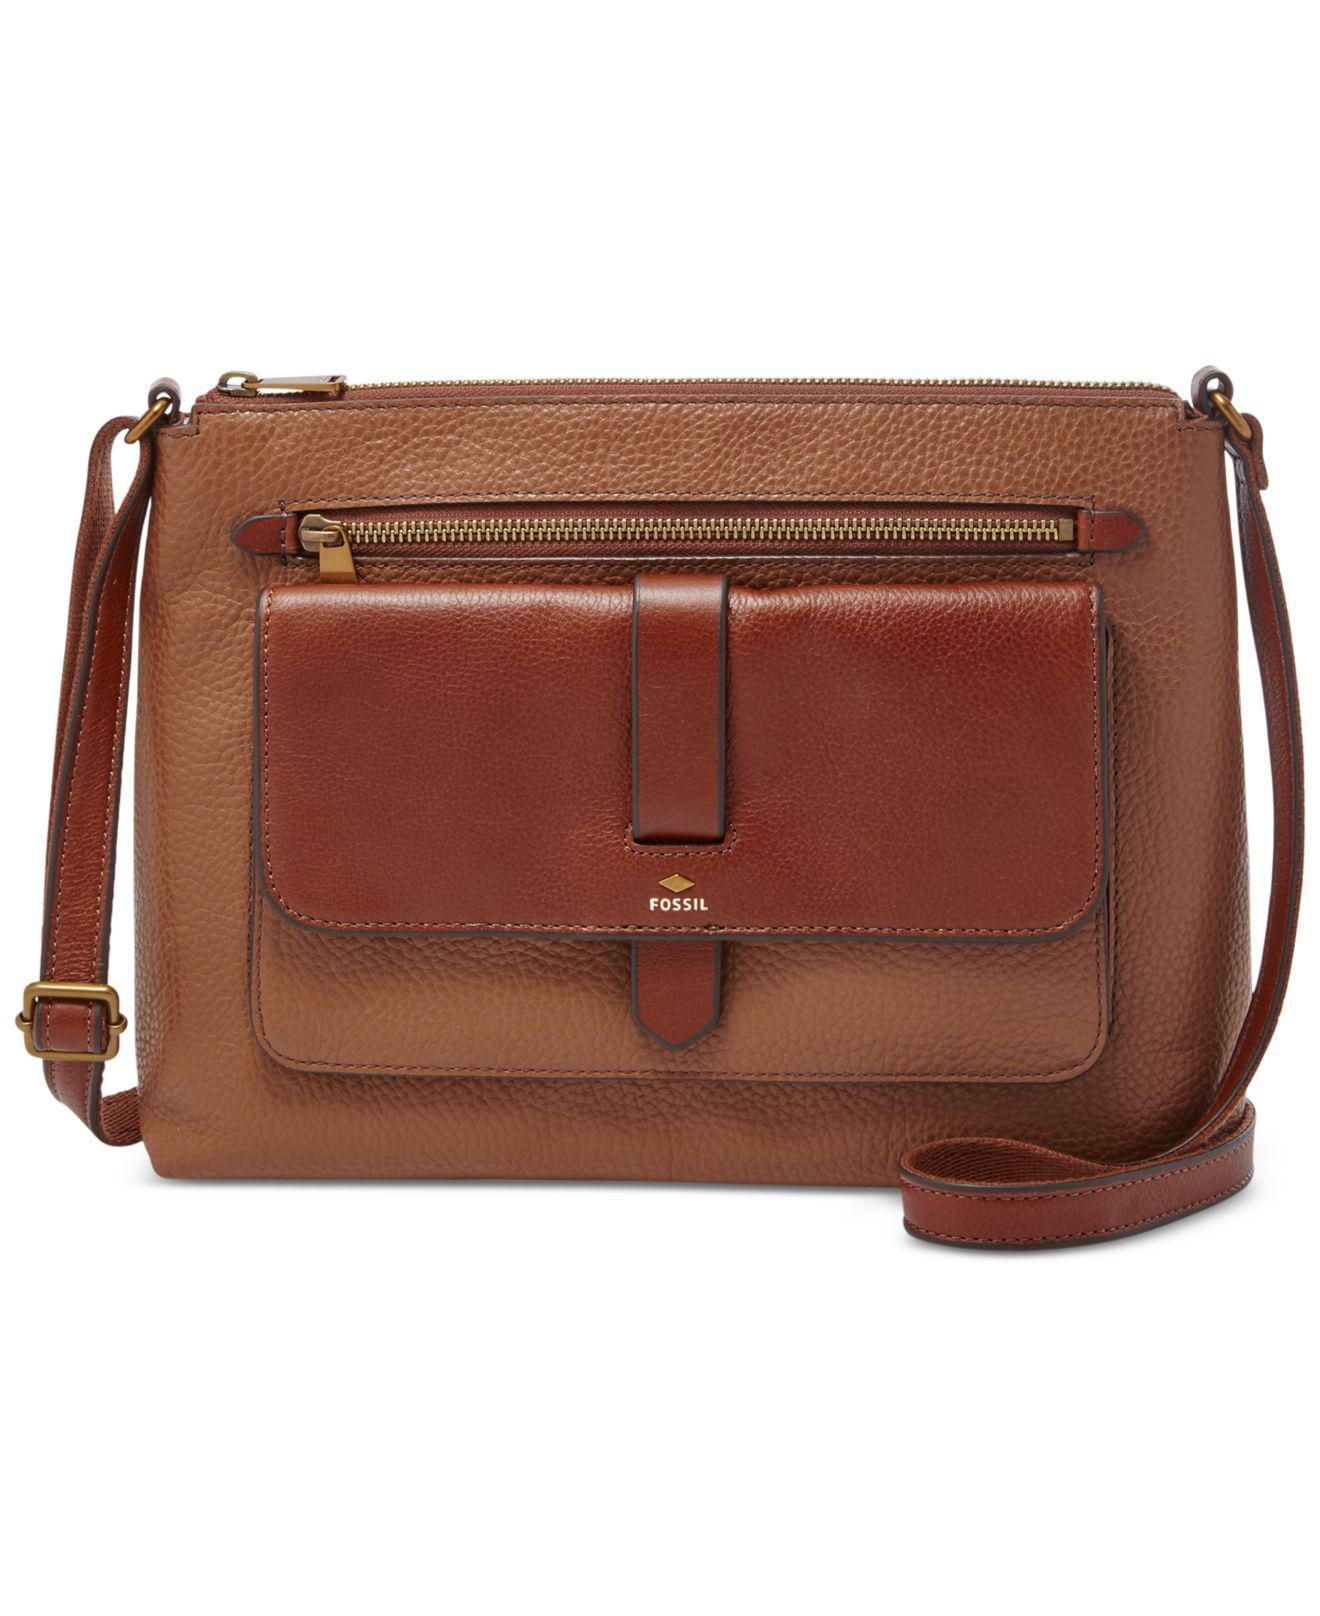 ffb255aaf5e8 Fossil - Brown Kinley Leather Medium Across Body Bag - Lyst. View fullscreen